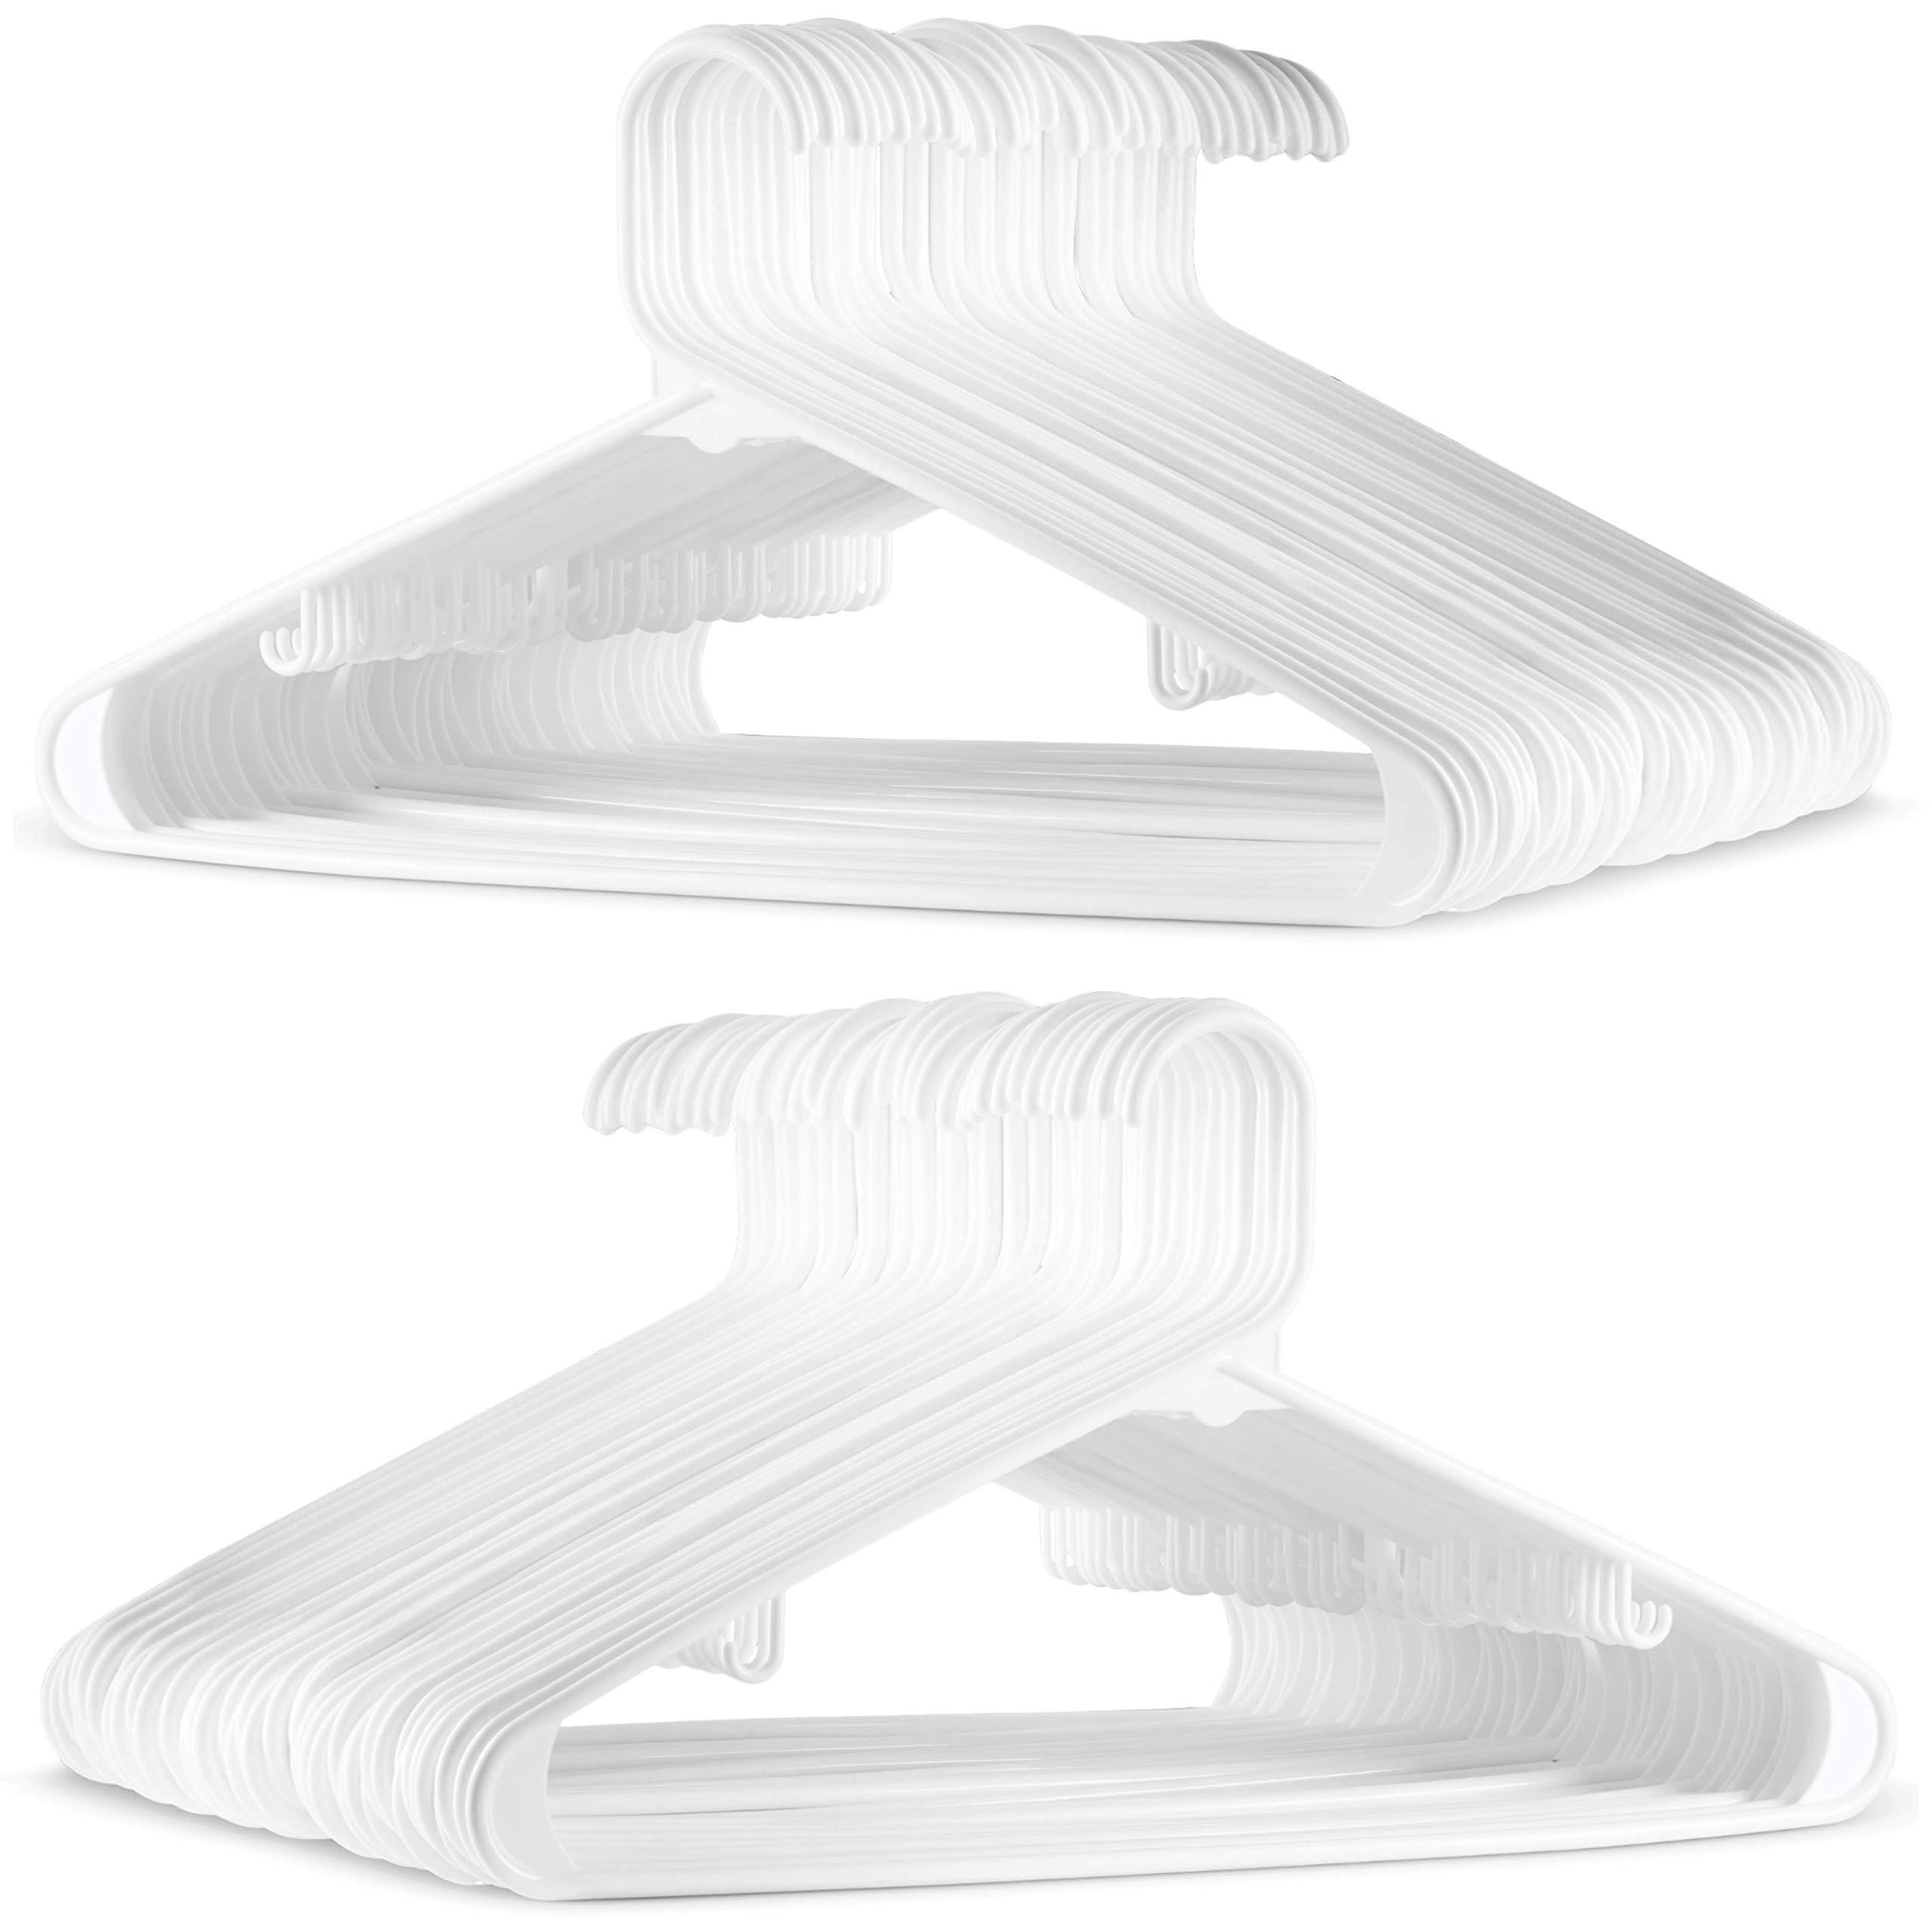 White Standard Plastic Hangers (60 PACK) Long Lasting Tubular Coat Hangers Plastic, Laundry & Dorm Room Hanger, Durable, Slim & Space Saving, Heavy Duty Clothes Hanger, Dress Notches, Strong Pants Bar by ZOBER